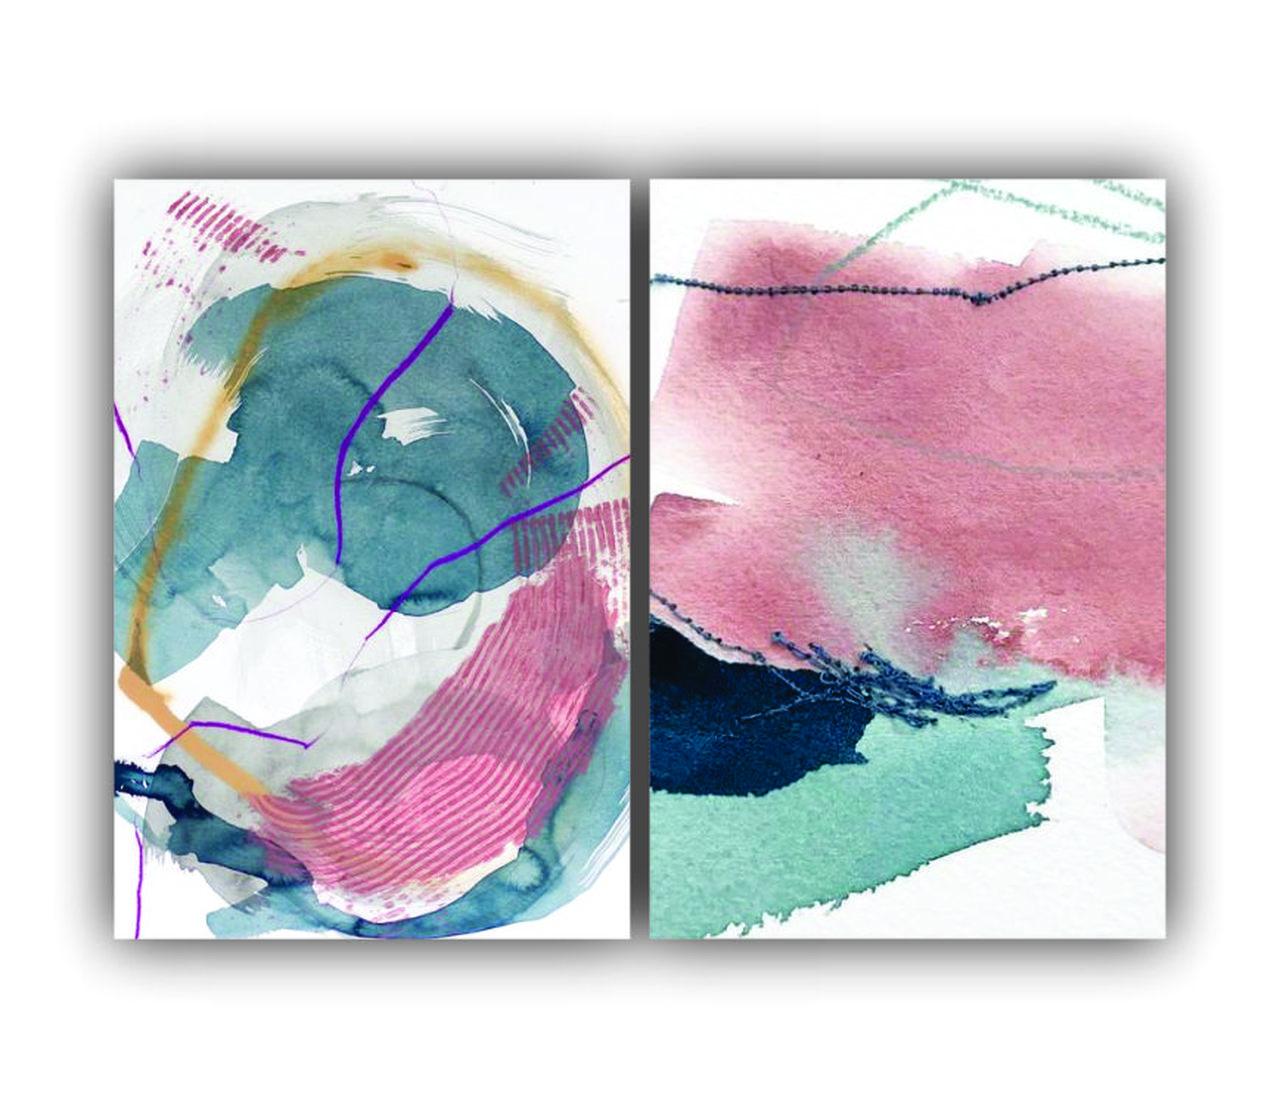 Quadro Abstrato Rosa e Azul Luxo -  Kit 2 telas